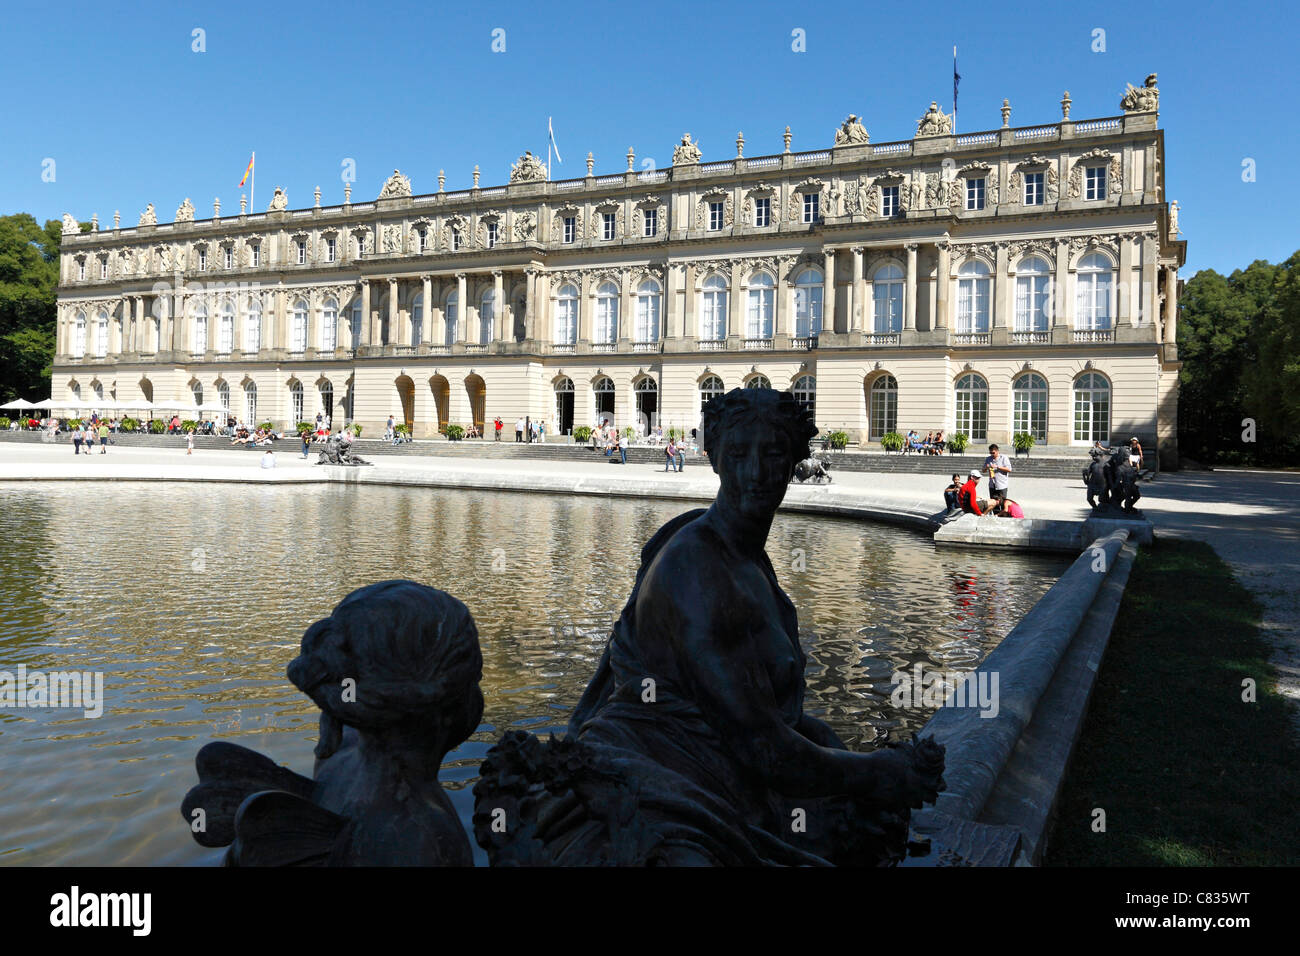 Herrechiemsee Schloss Palace and Fortuna Fountain, Herreninsel Chiemgau Upper Bavaria Germany - Stock Image